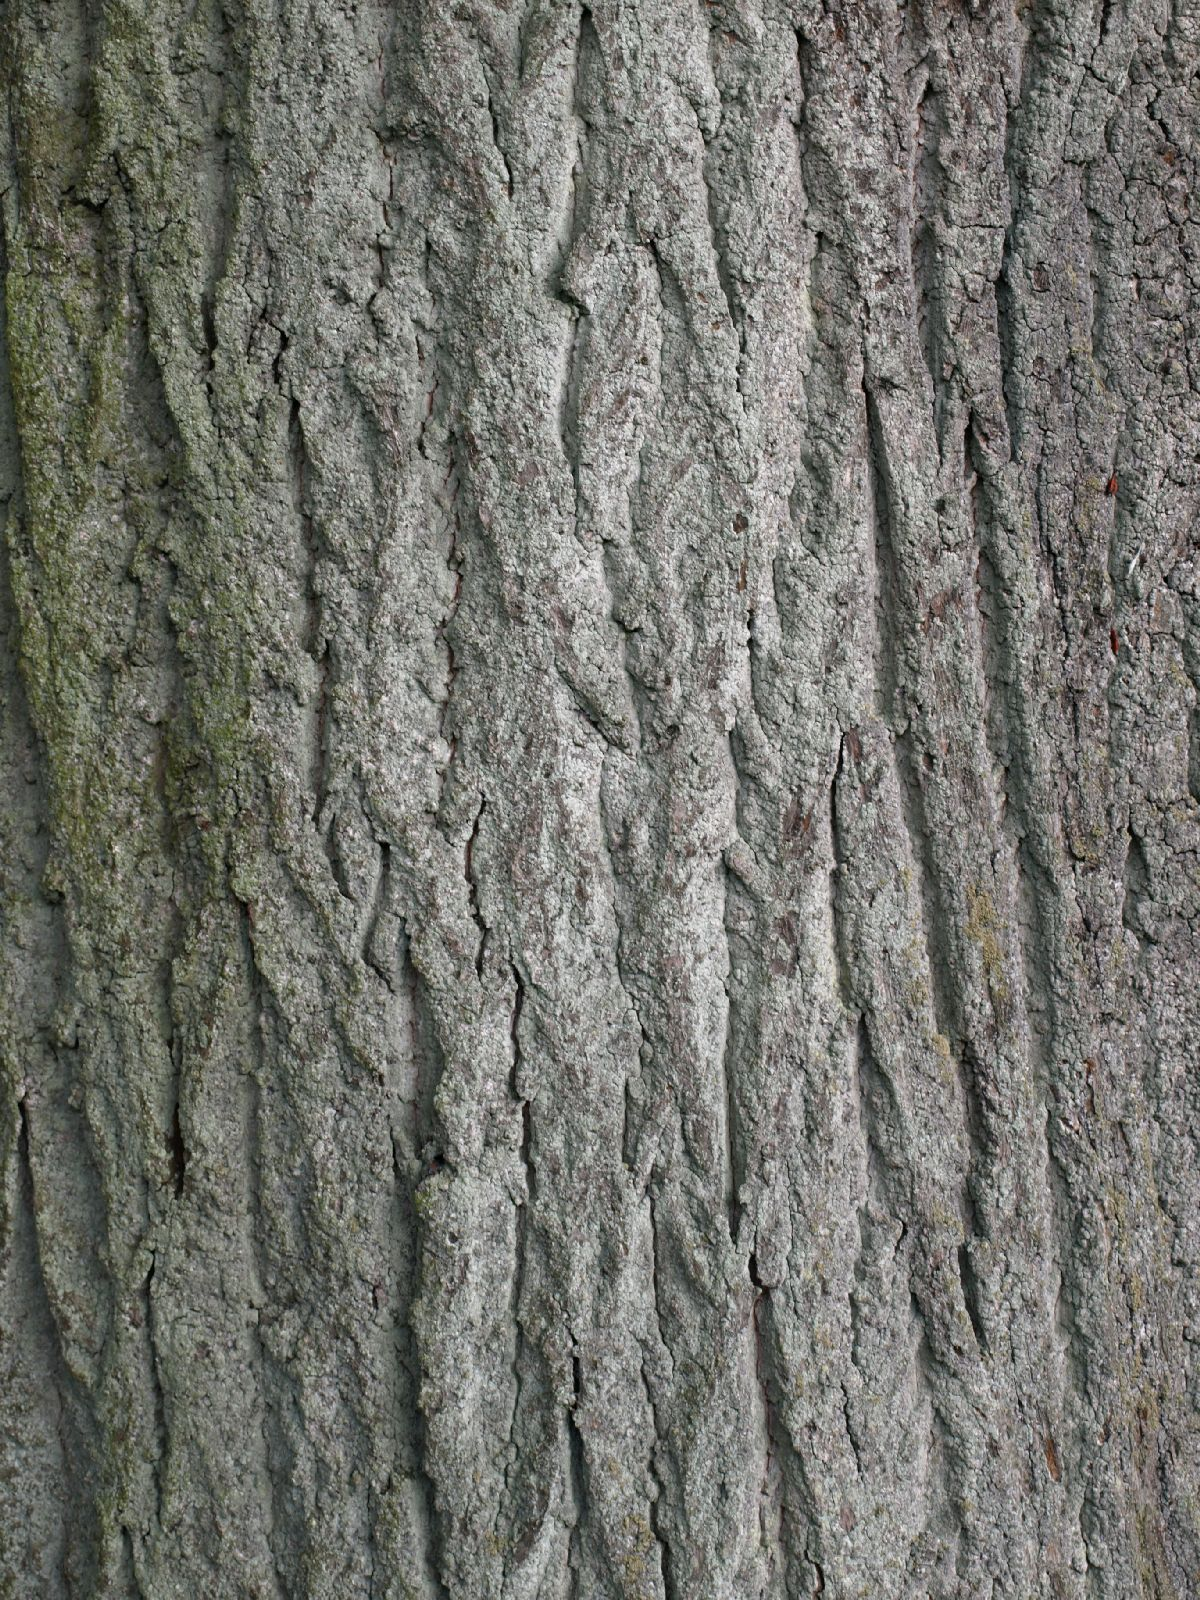 Baum-Rinde_Textur_A_P9285584